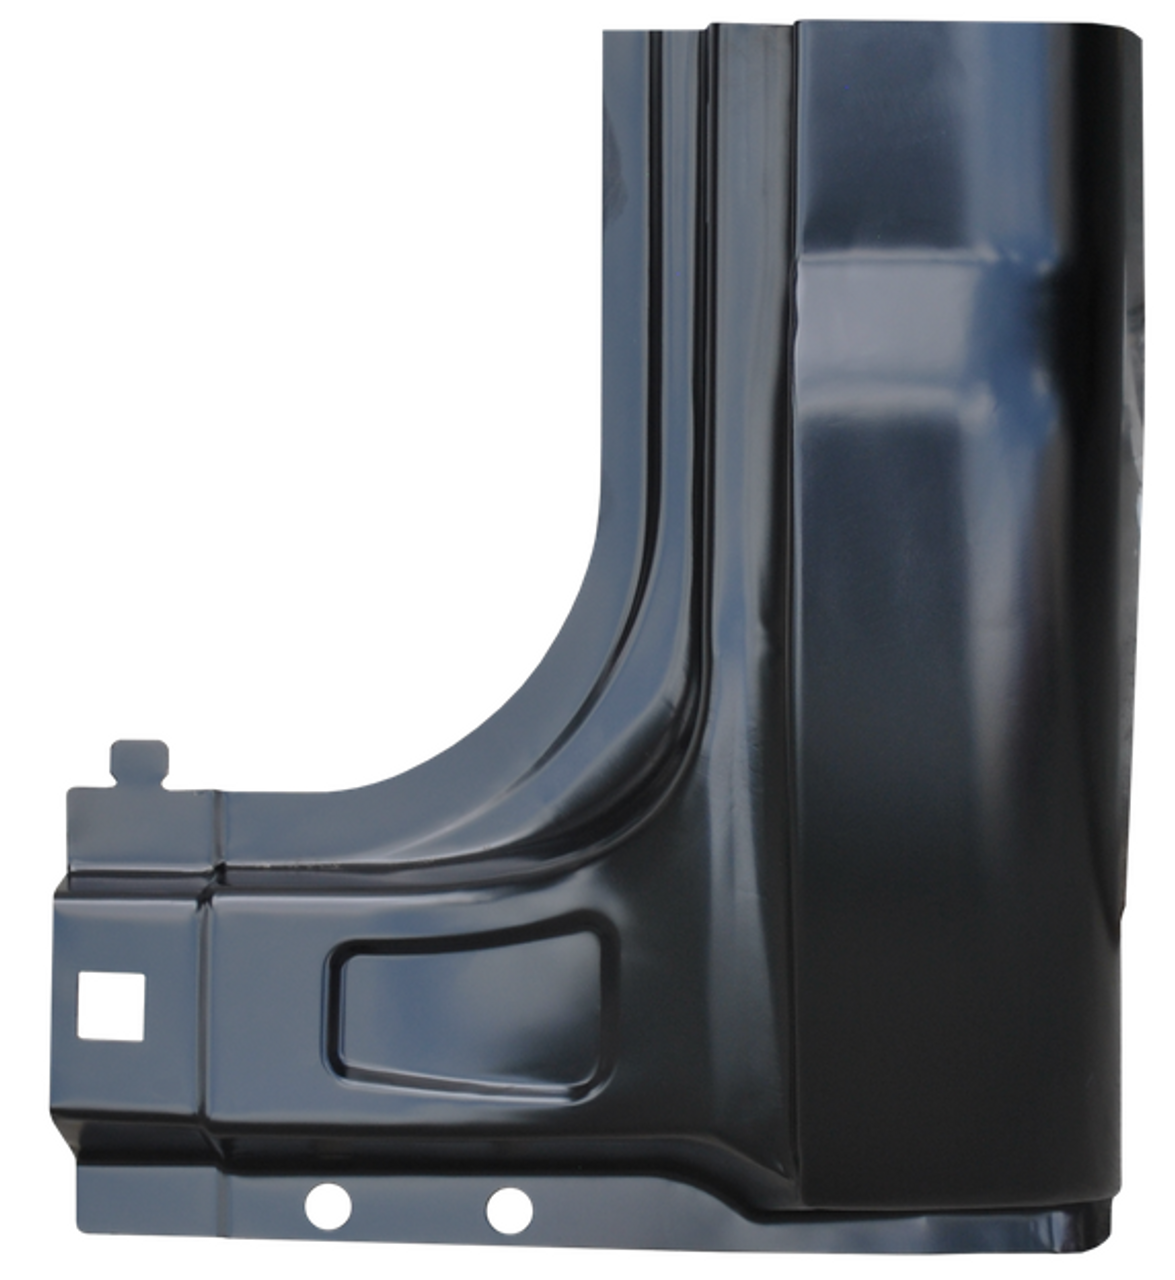 Rh 1999-2016 Superduty Cab Corner With Rear Pillar 4 Door Extended Cab